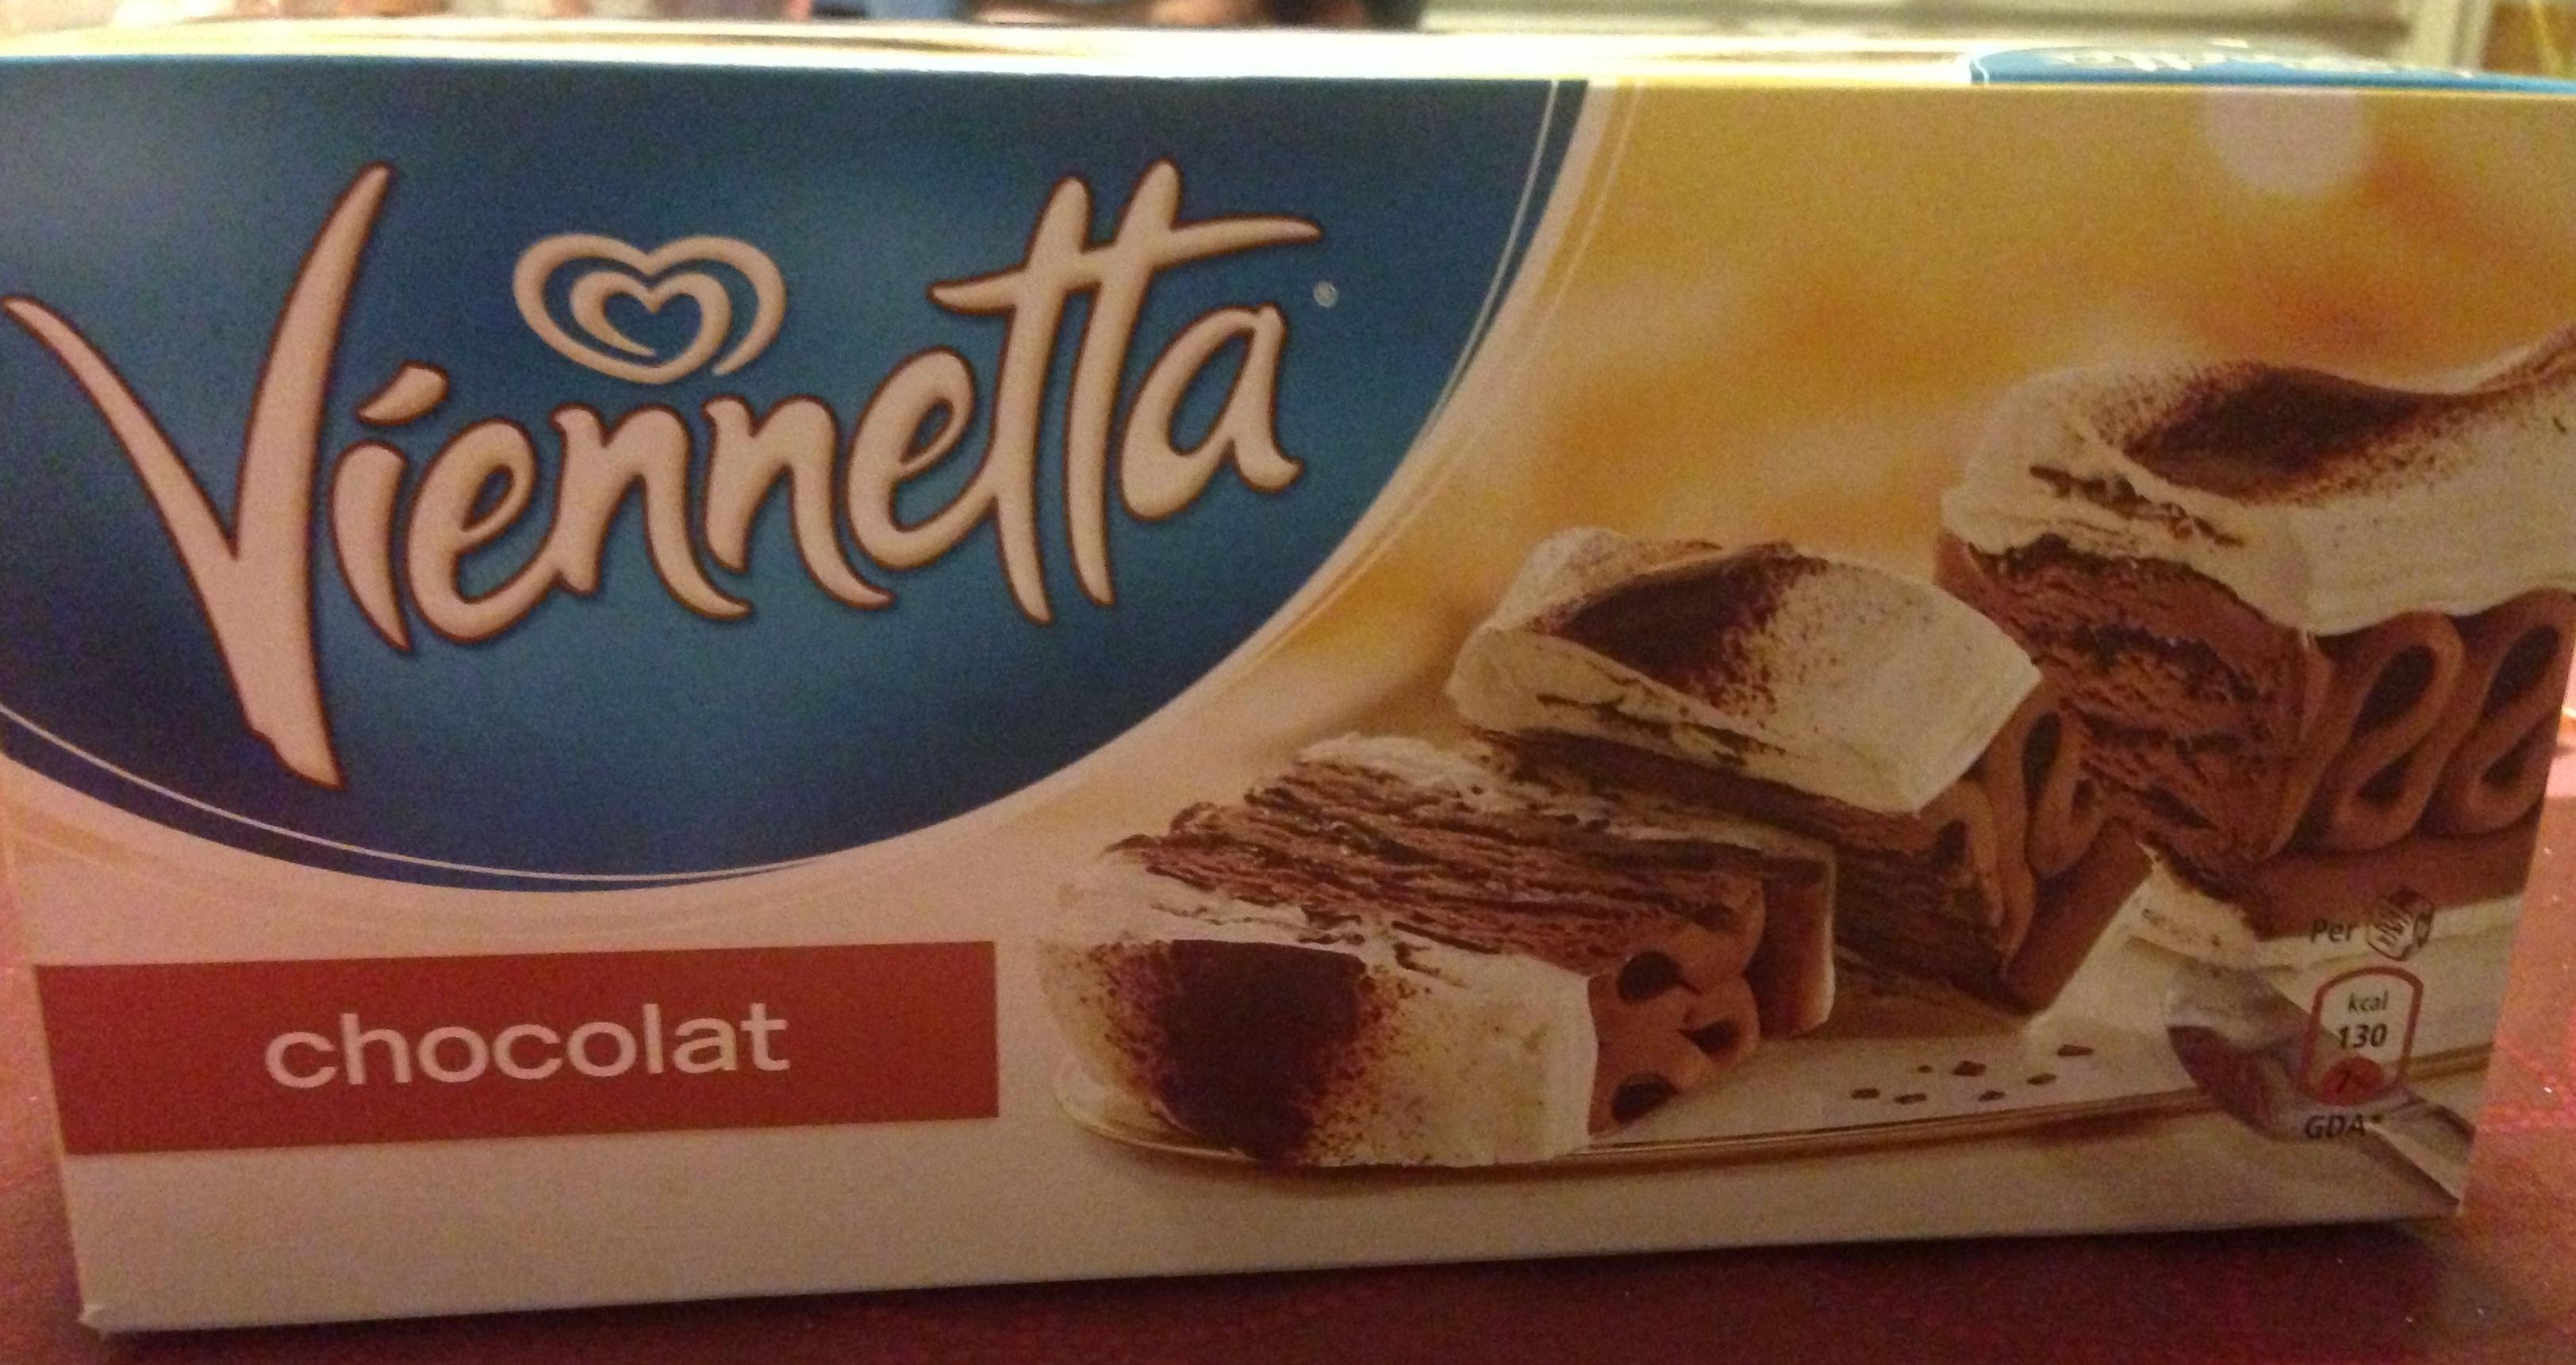 Viennetta chocolat - Produit